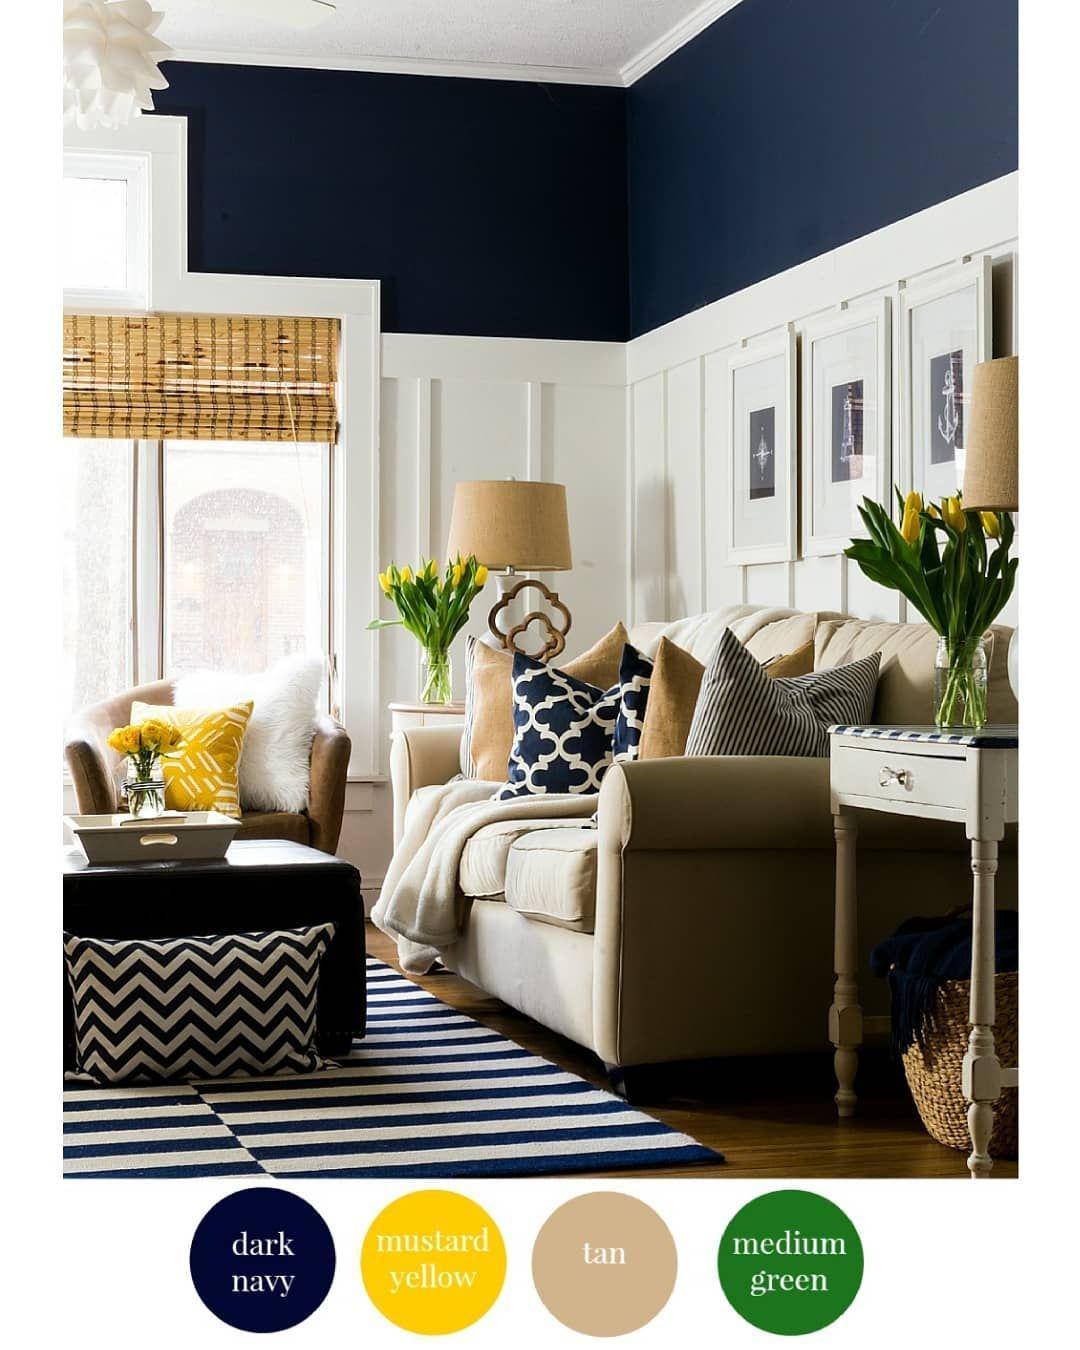 Color Combination No 3 Dark Navy Mustard Yellow Tan Green Color Colorscheme Navyblue Yellow Navy Living Rooms Summer Living Room Navy Blue Living Room